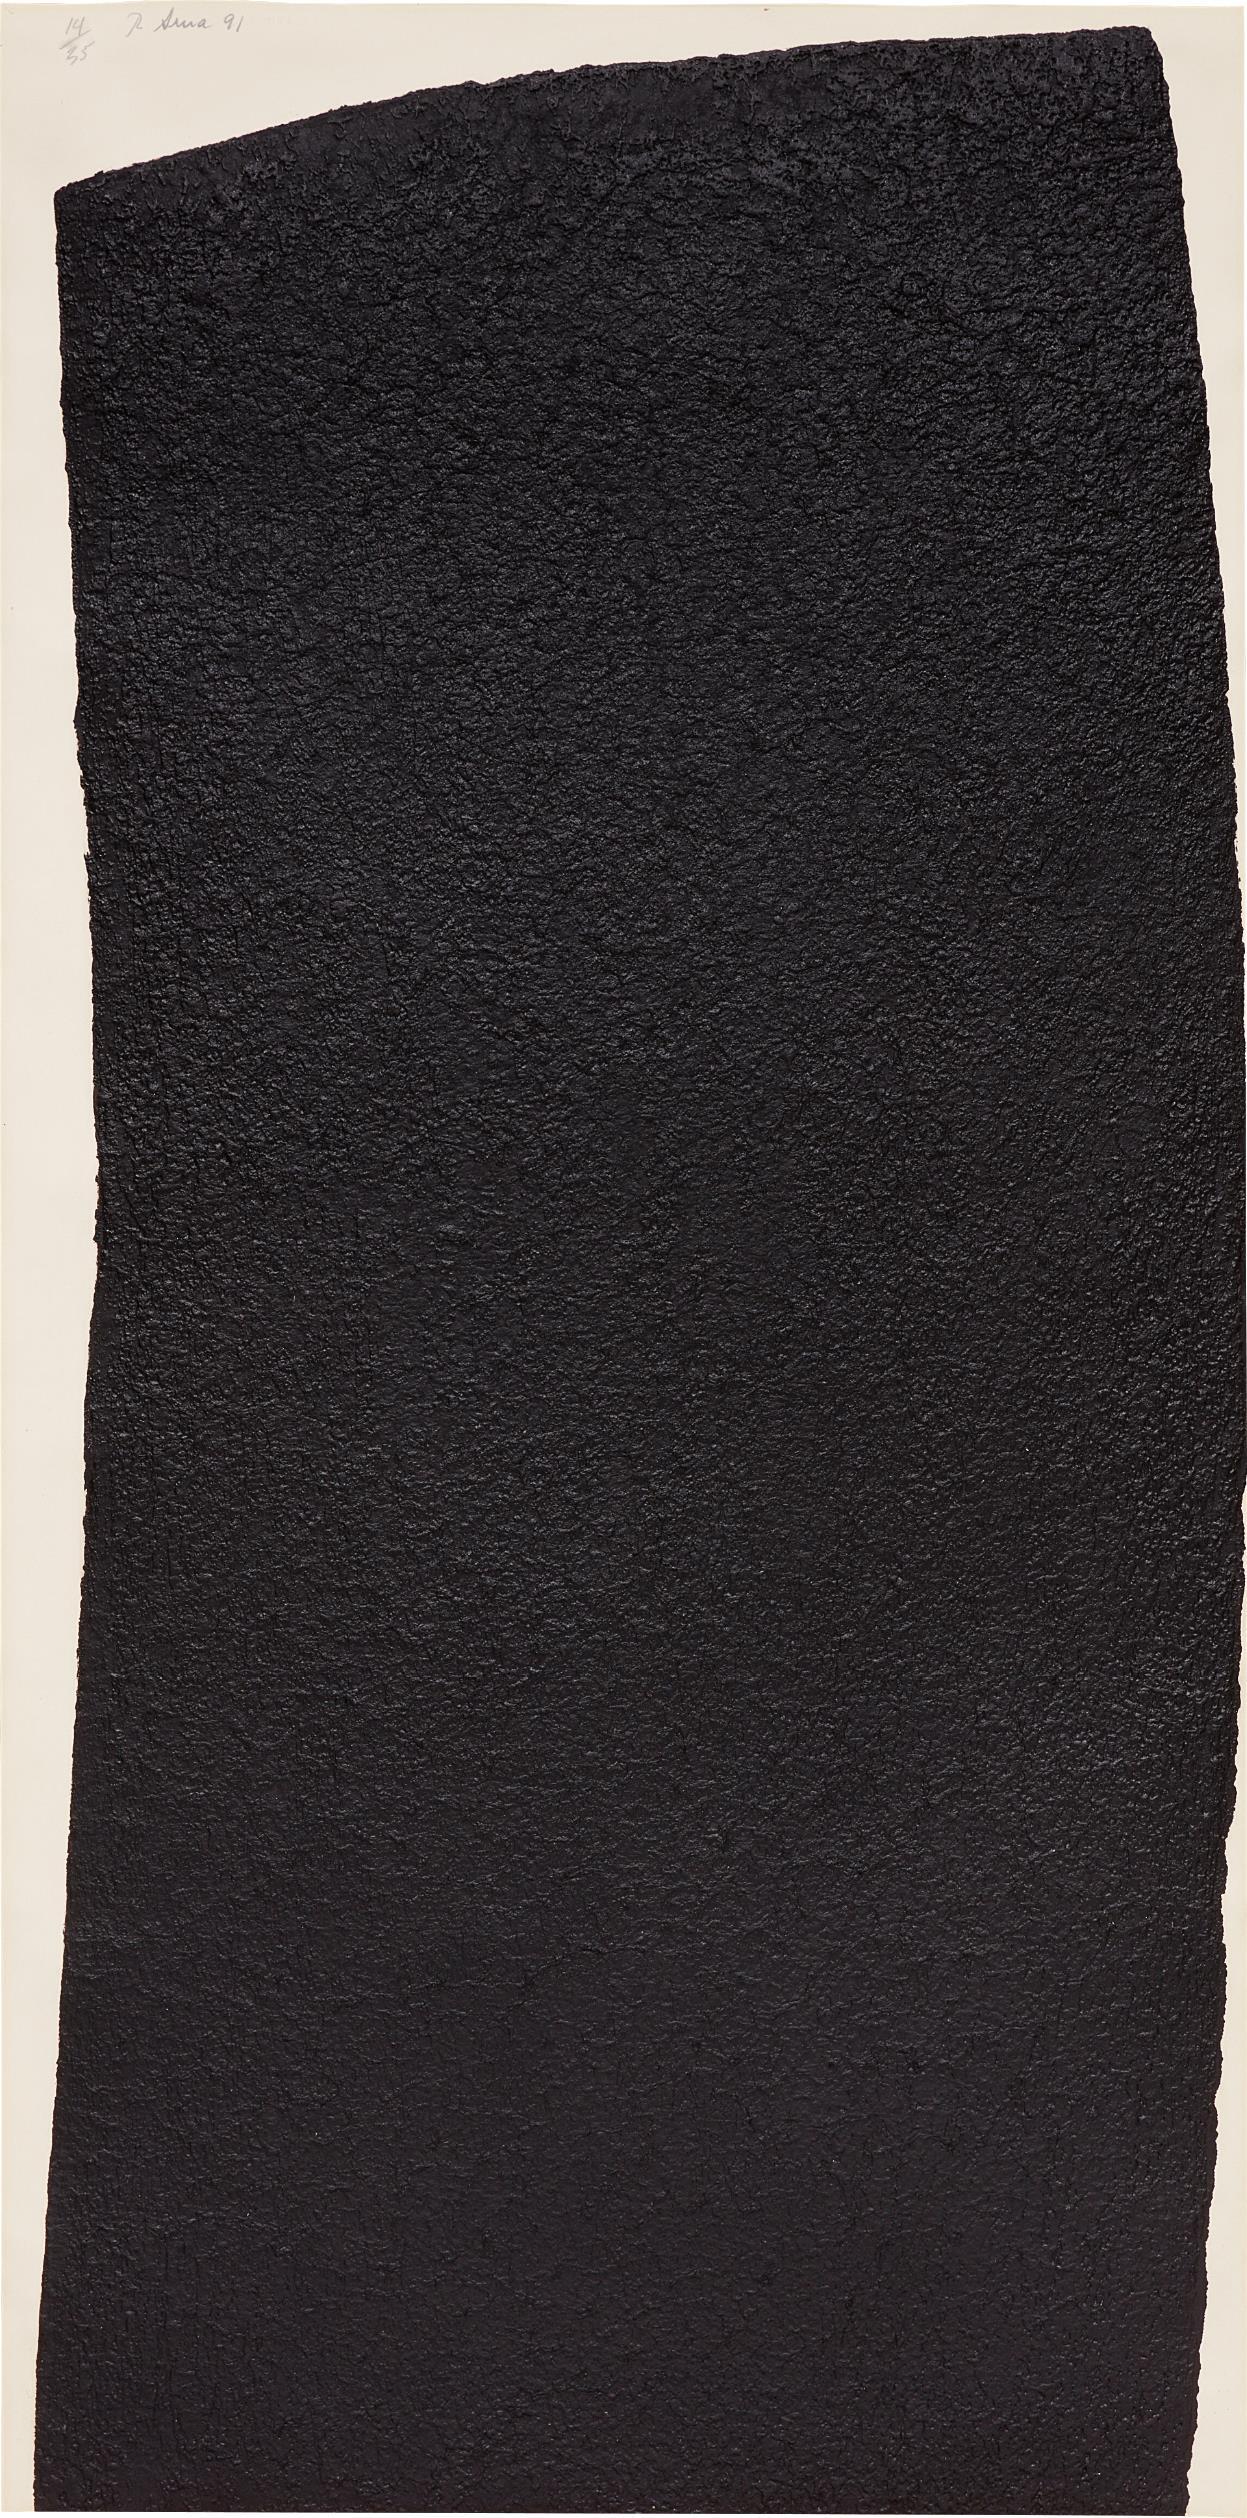 Richard Serra-Vesturey-1991